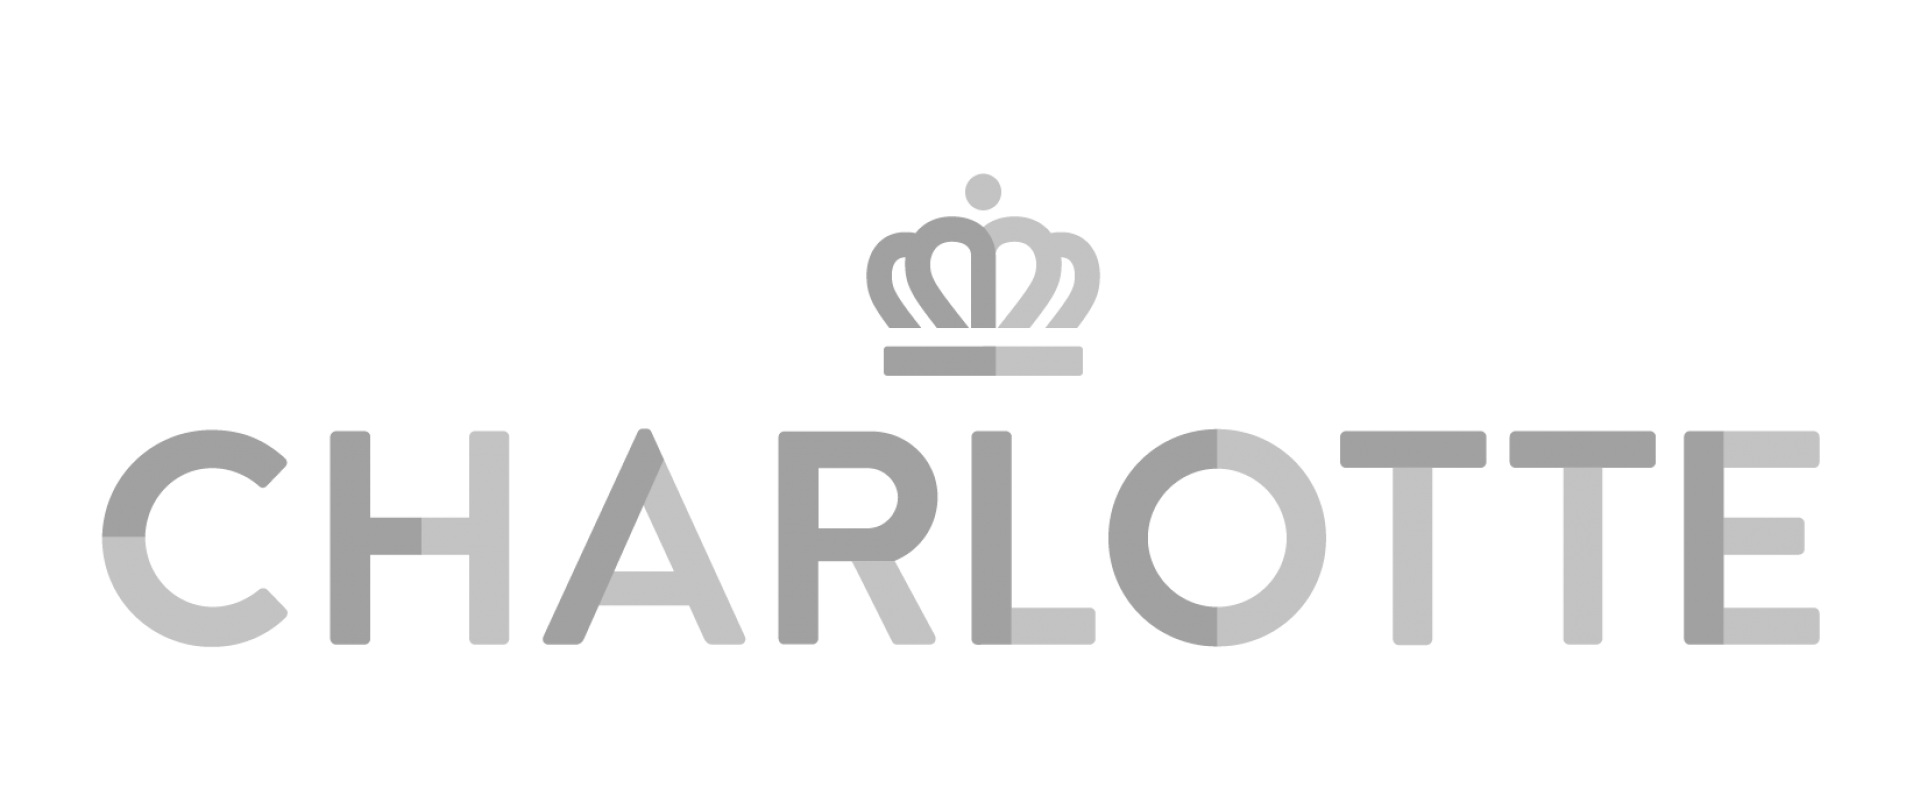 Charlotte-logo-BLUE-01-updated.png